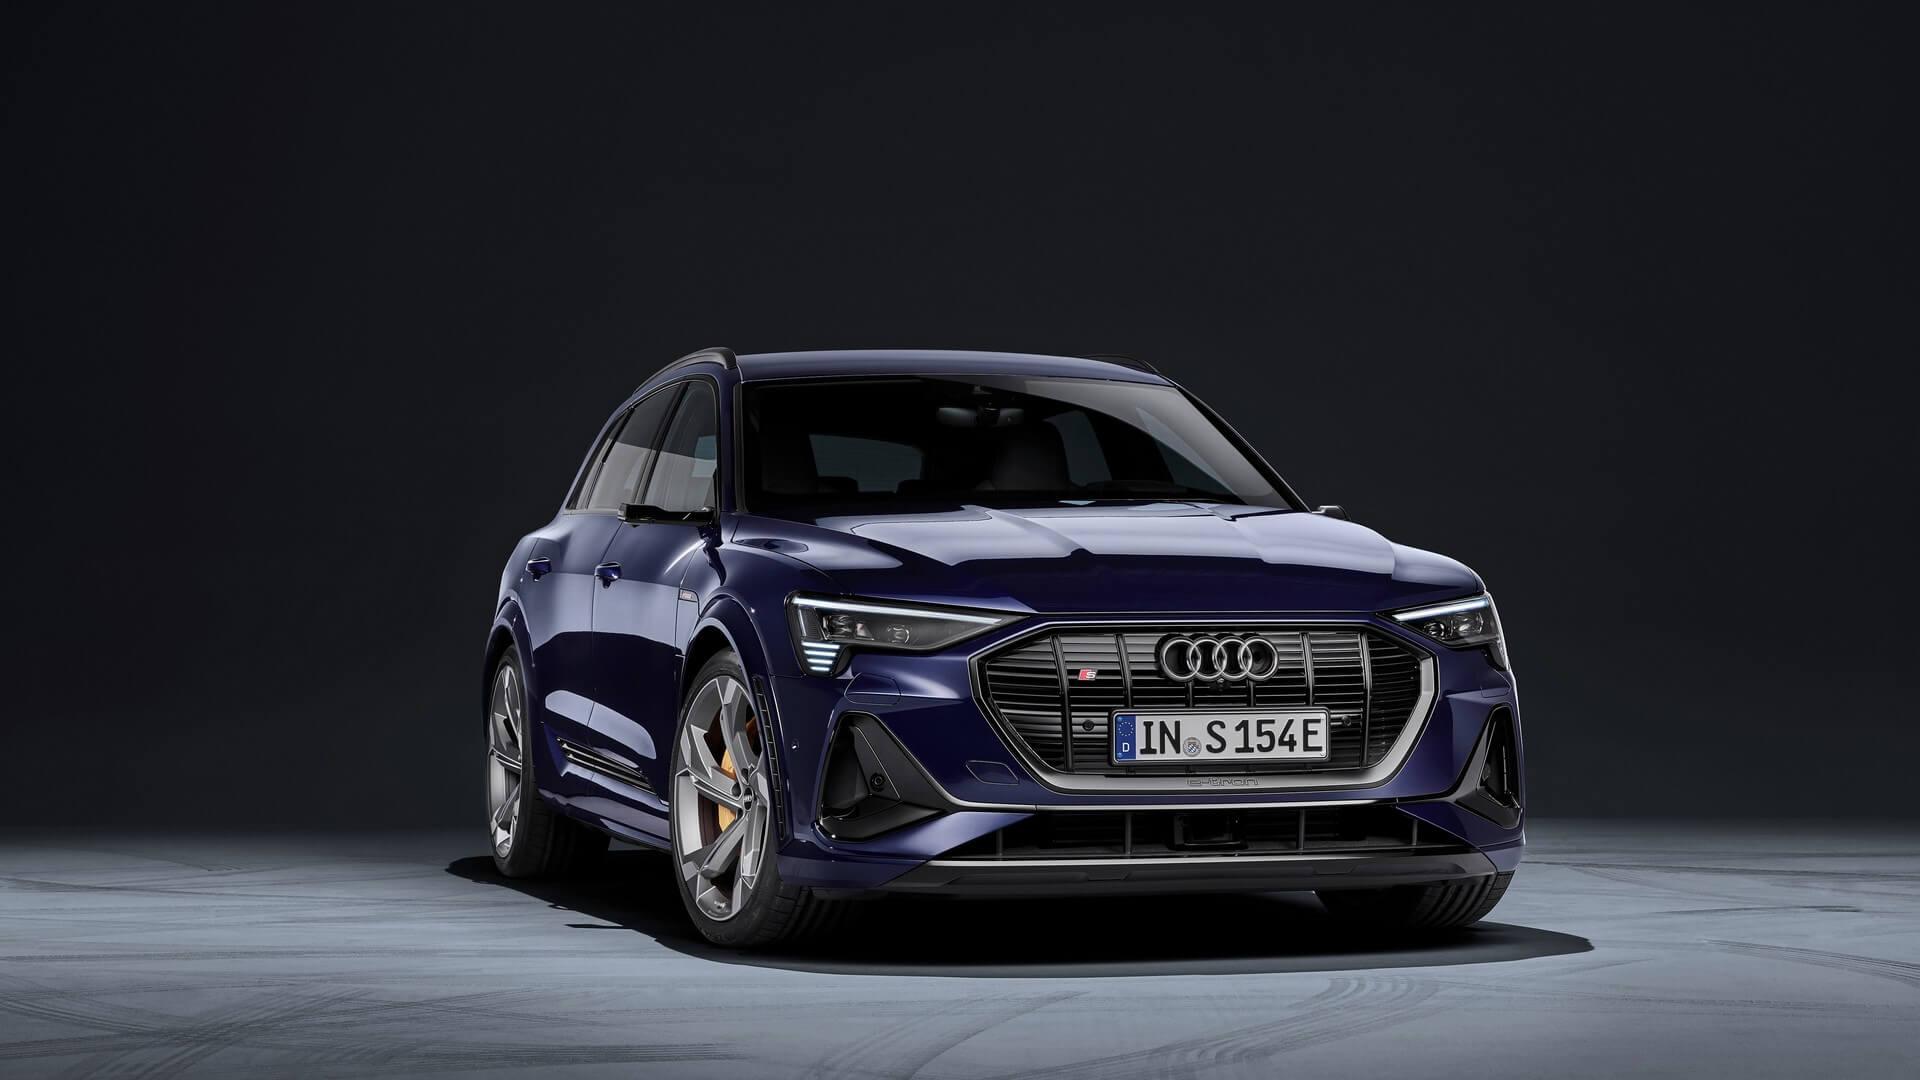 Audi-E-Tron-S-and-E-Tron-S-Sportback-2020-29